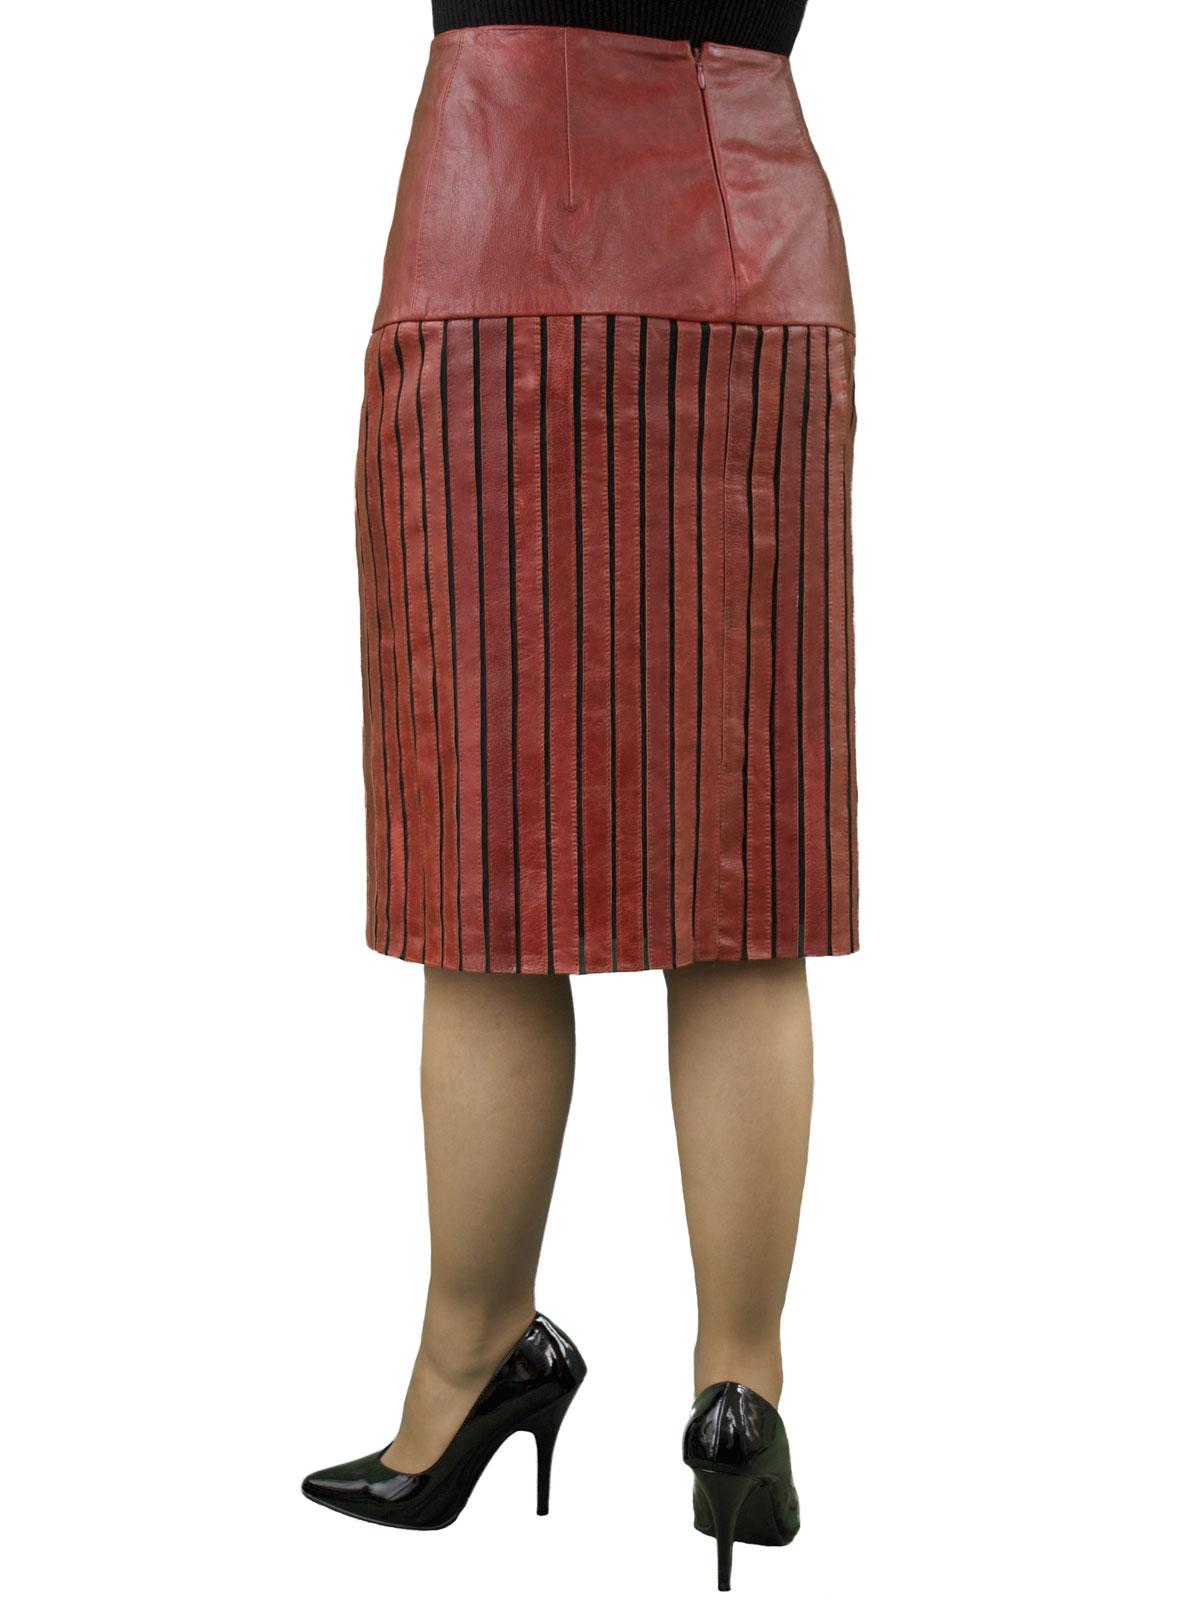 Skirts & Dresses Archives - Tout Ensemble